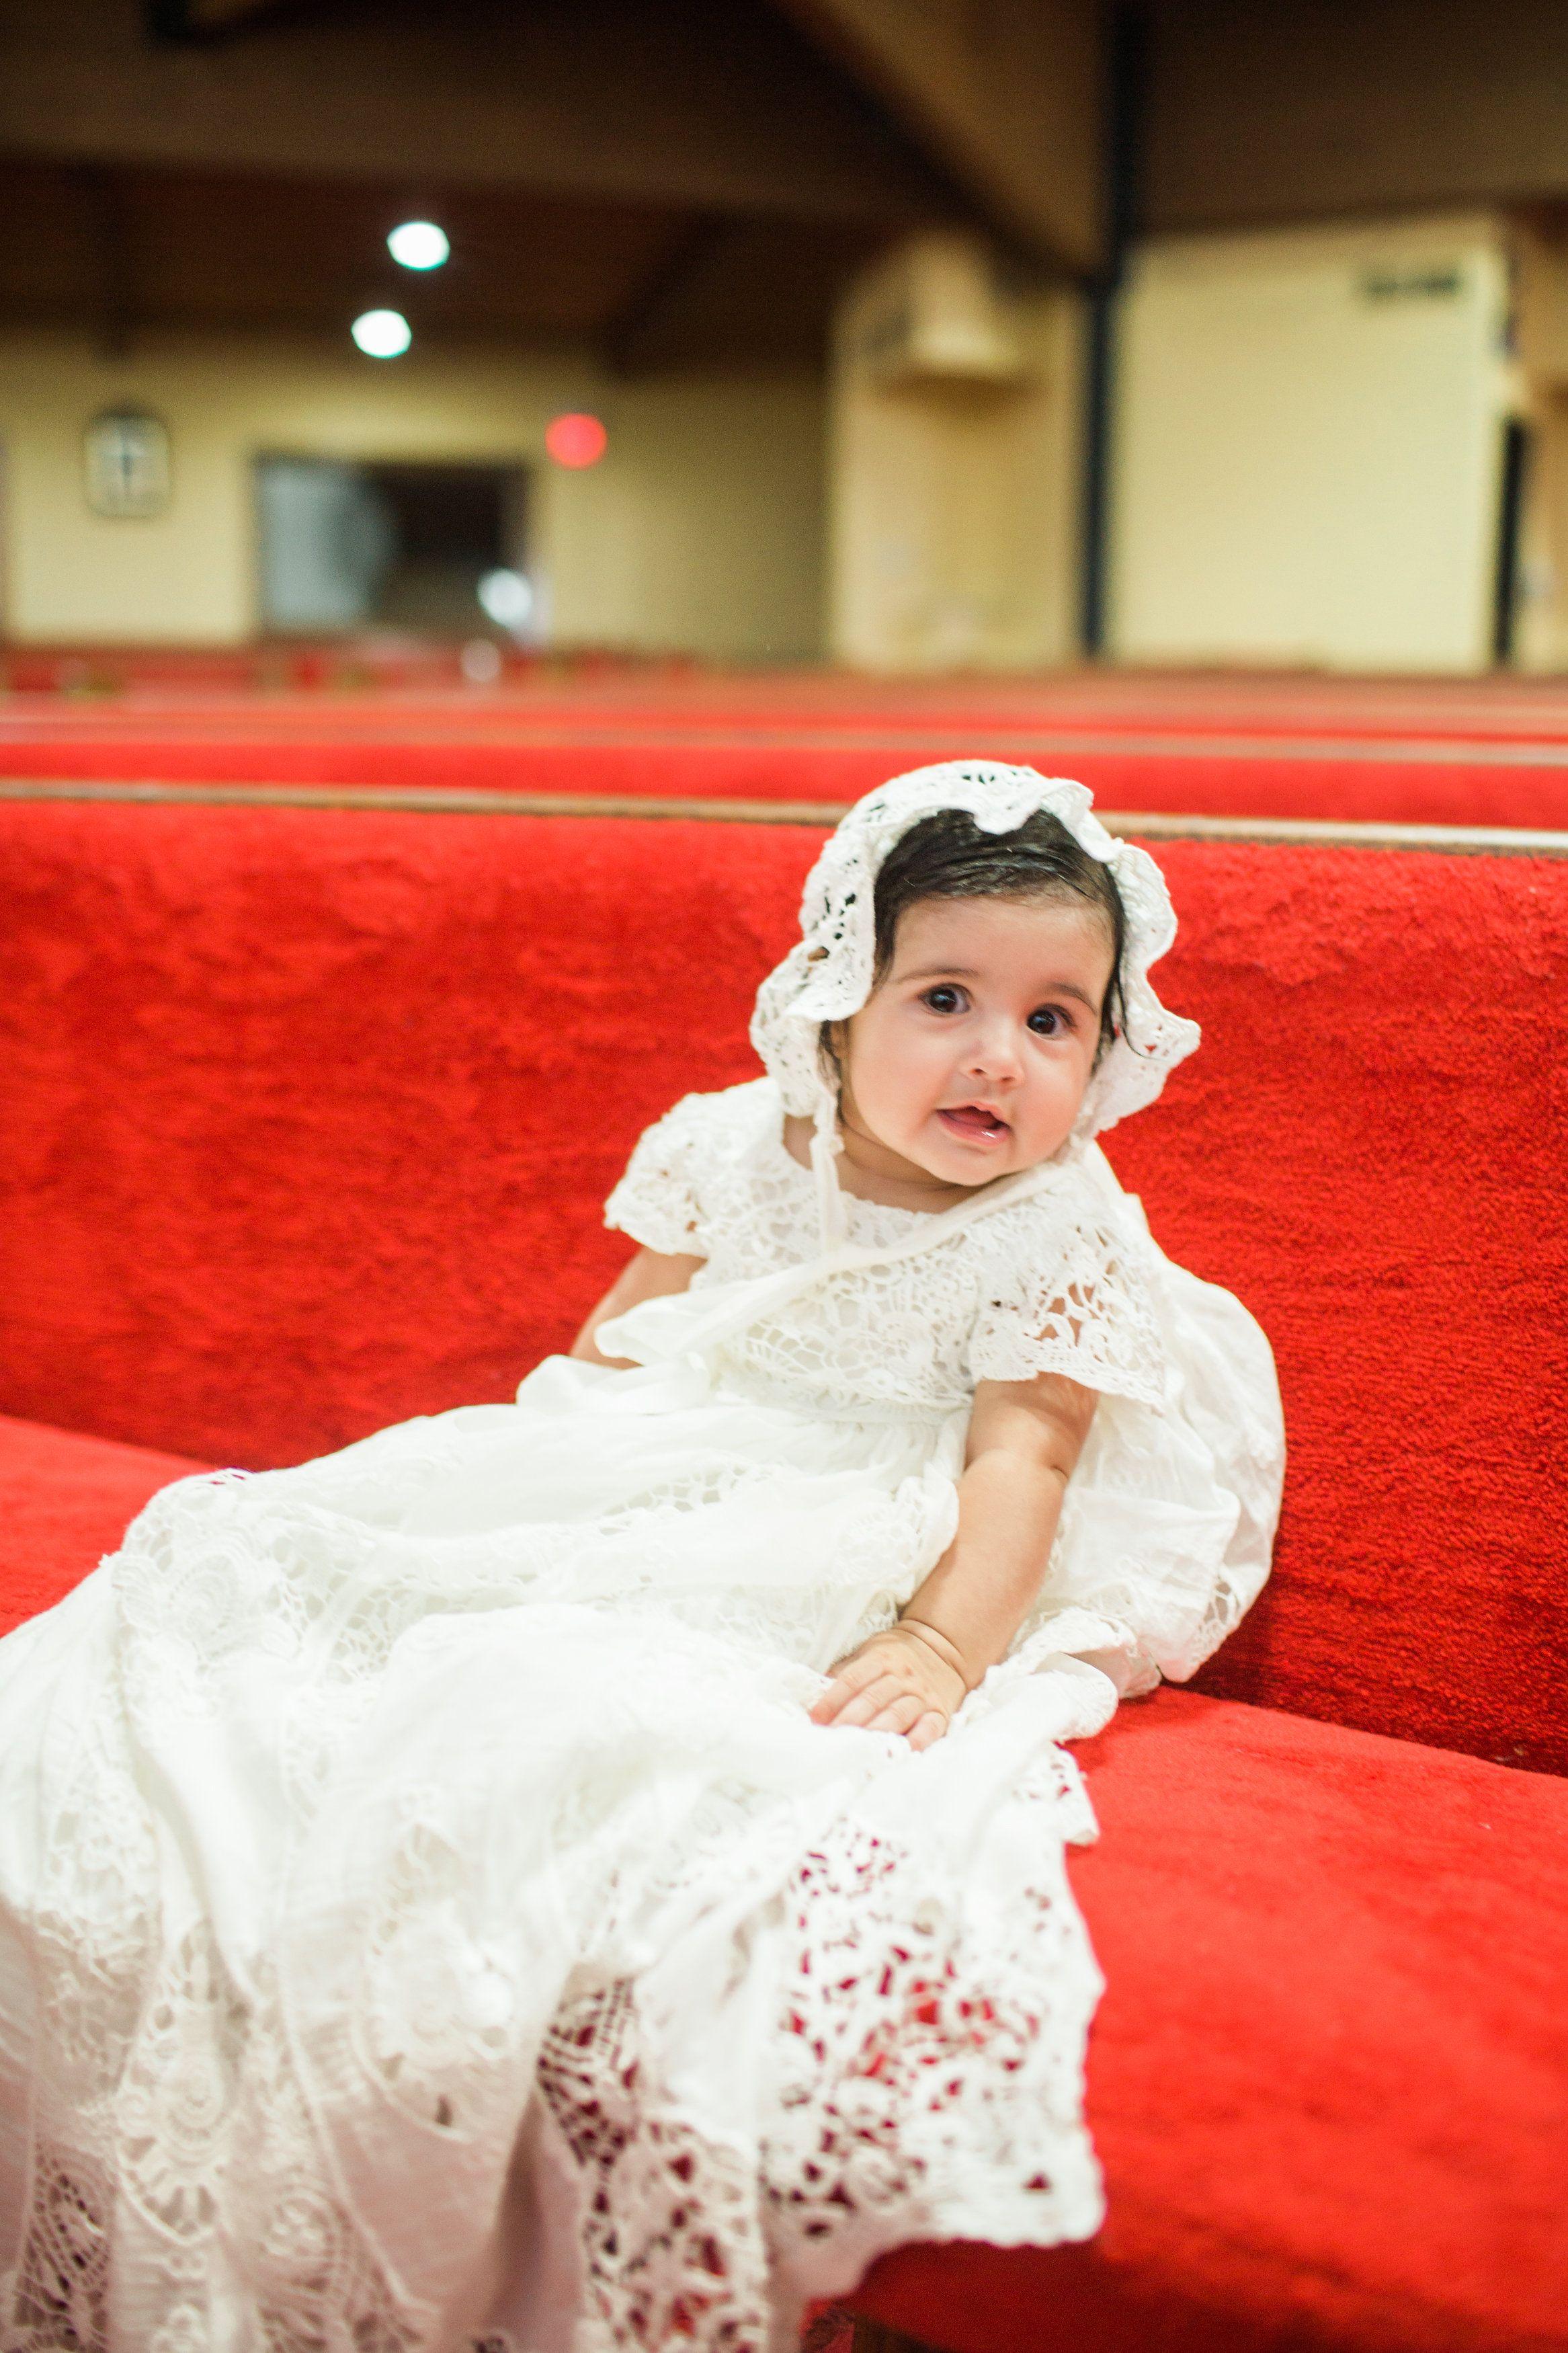 89a8a602289d Christening Gown Photos - Grace Christening Gown   Bonnet Set ...